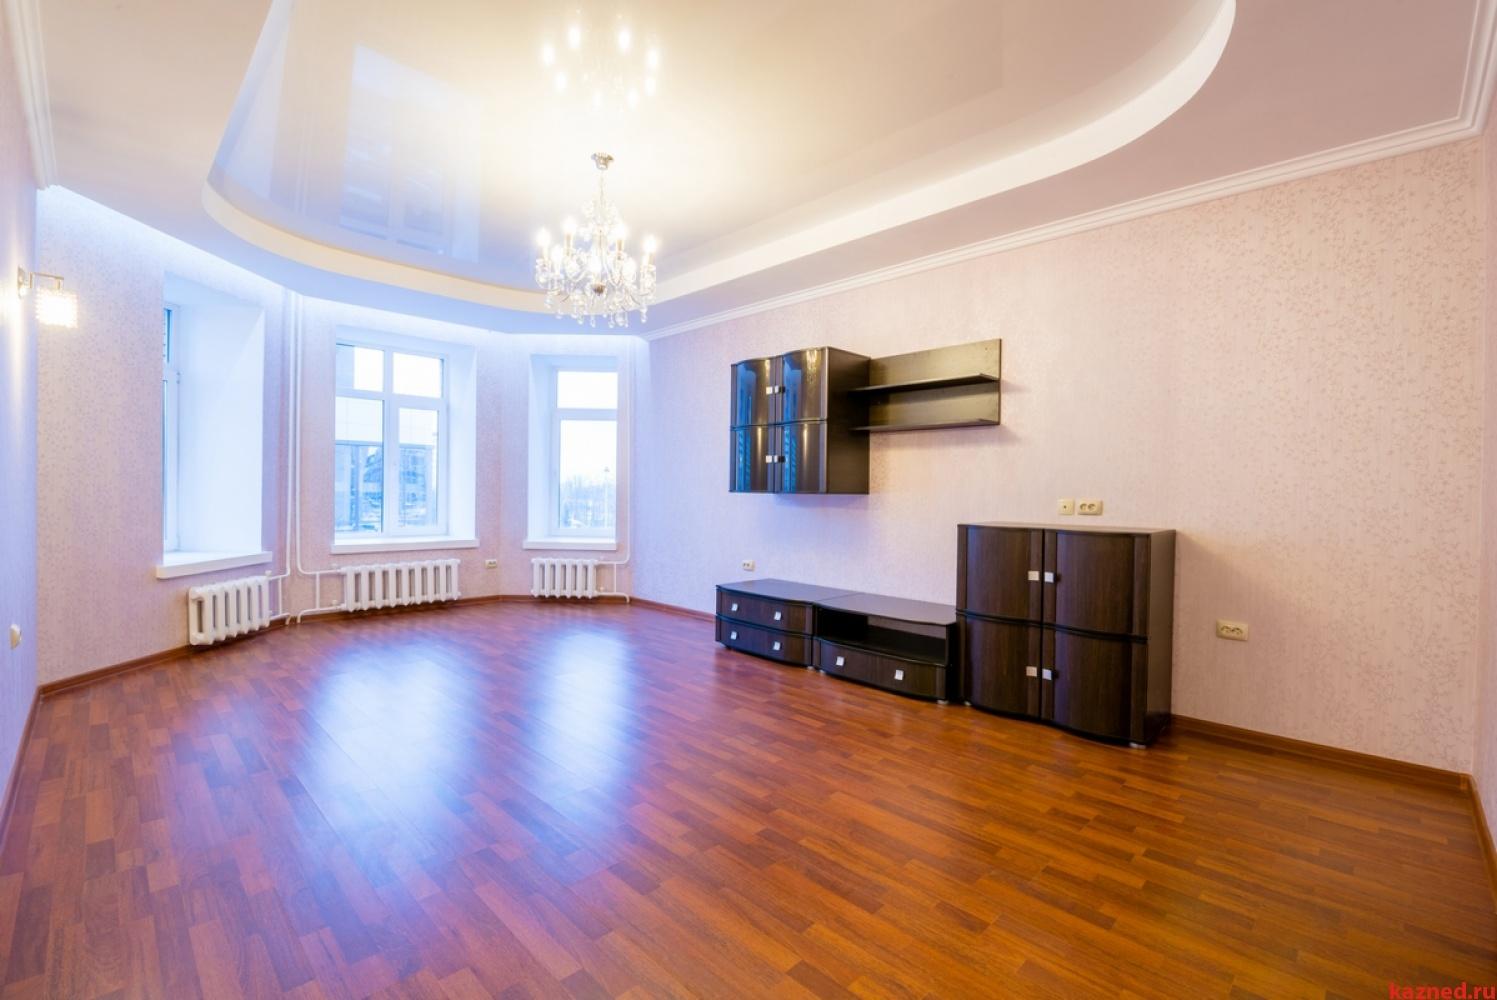 Продажа 2-к квартиры Баки Урманче д.6, 72 м² (миниатюра №1)